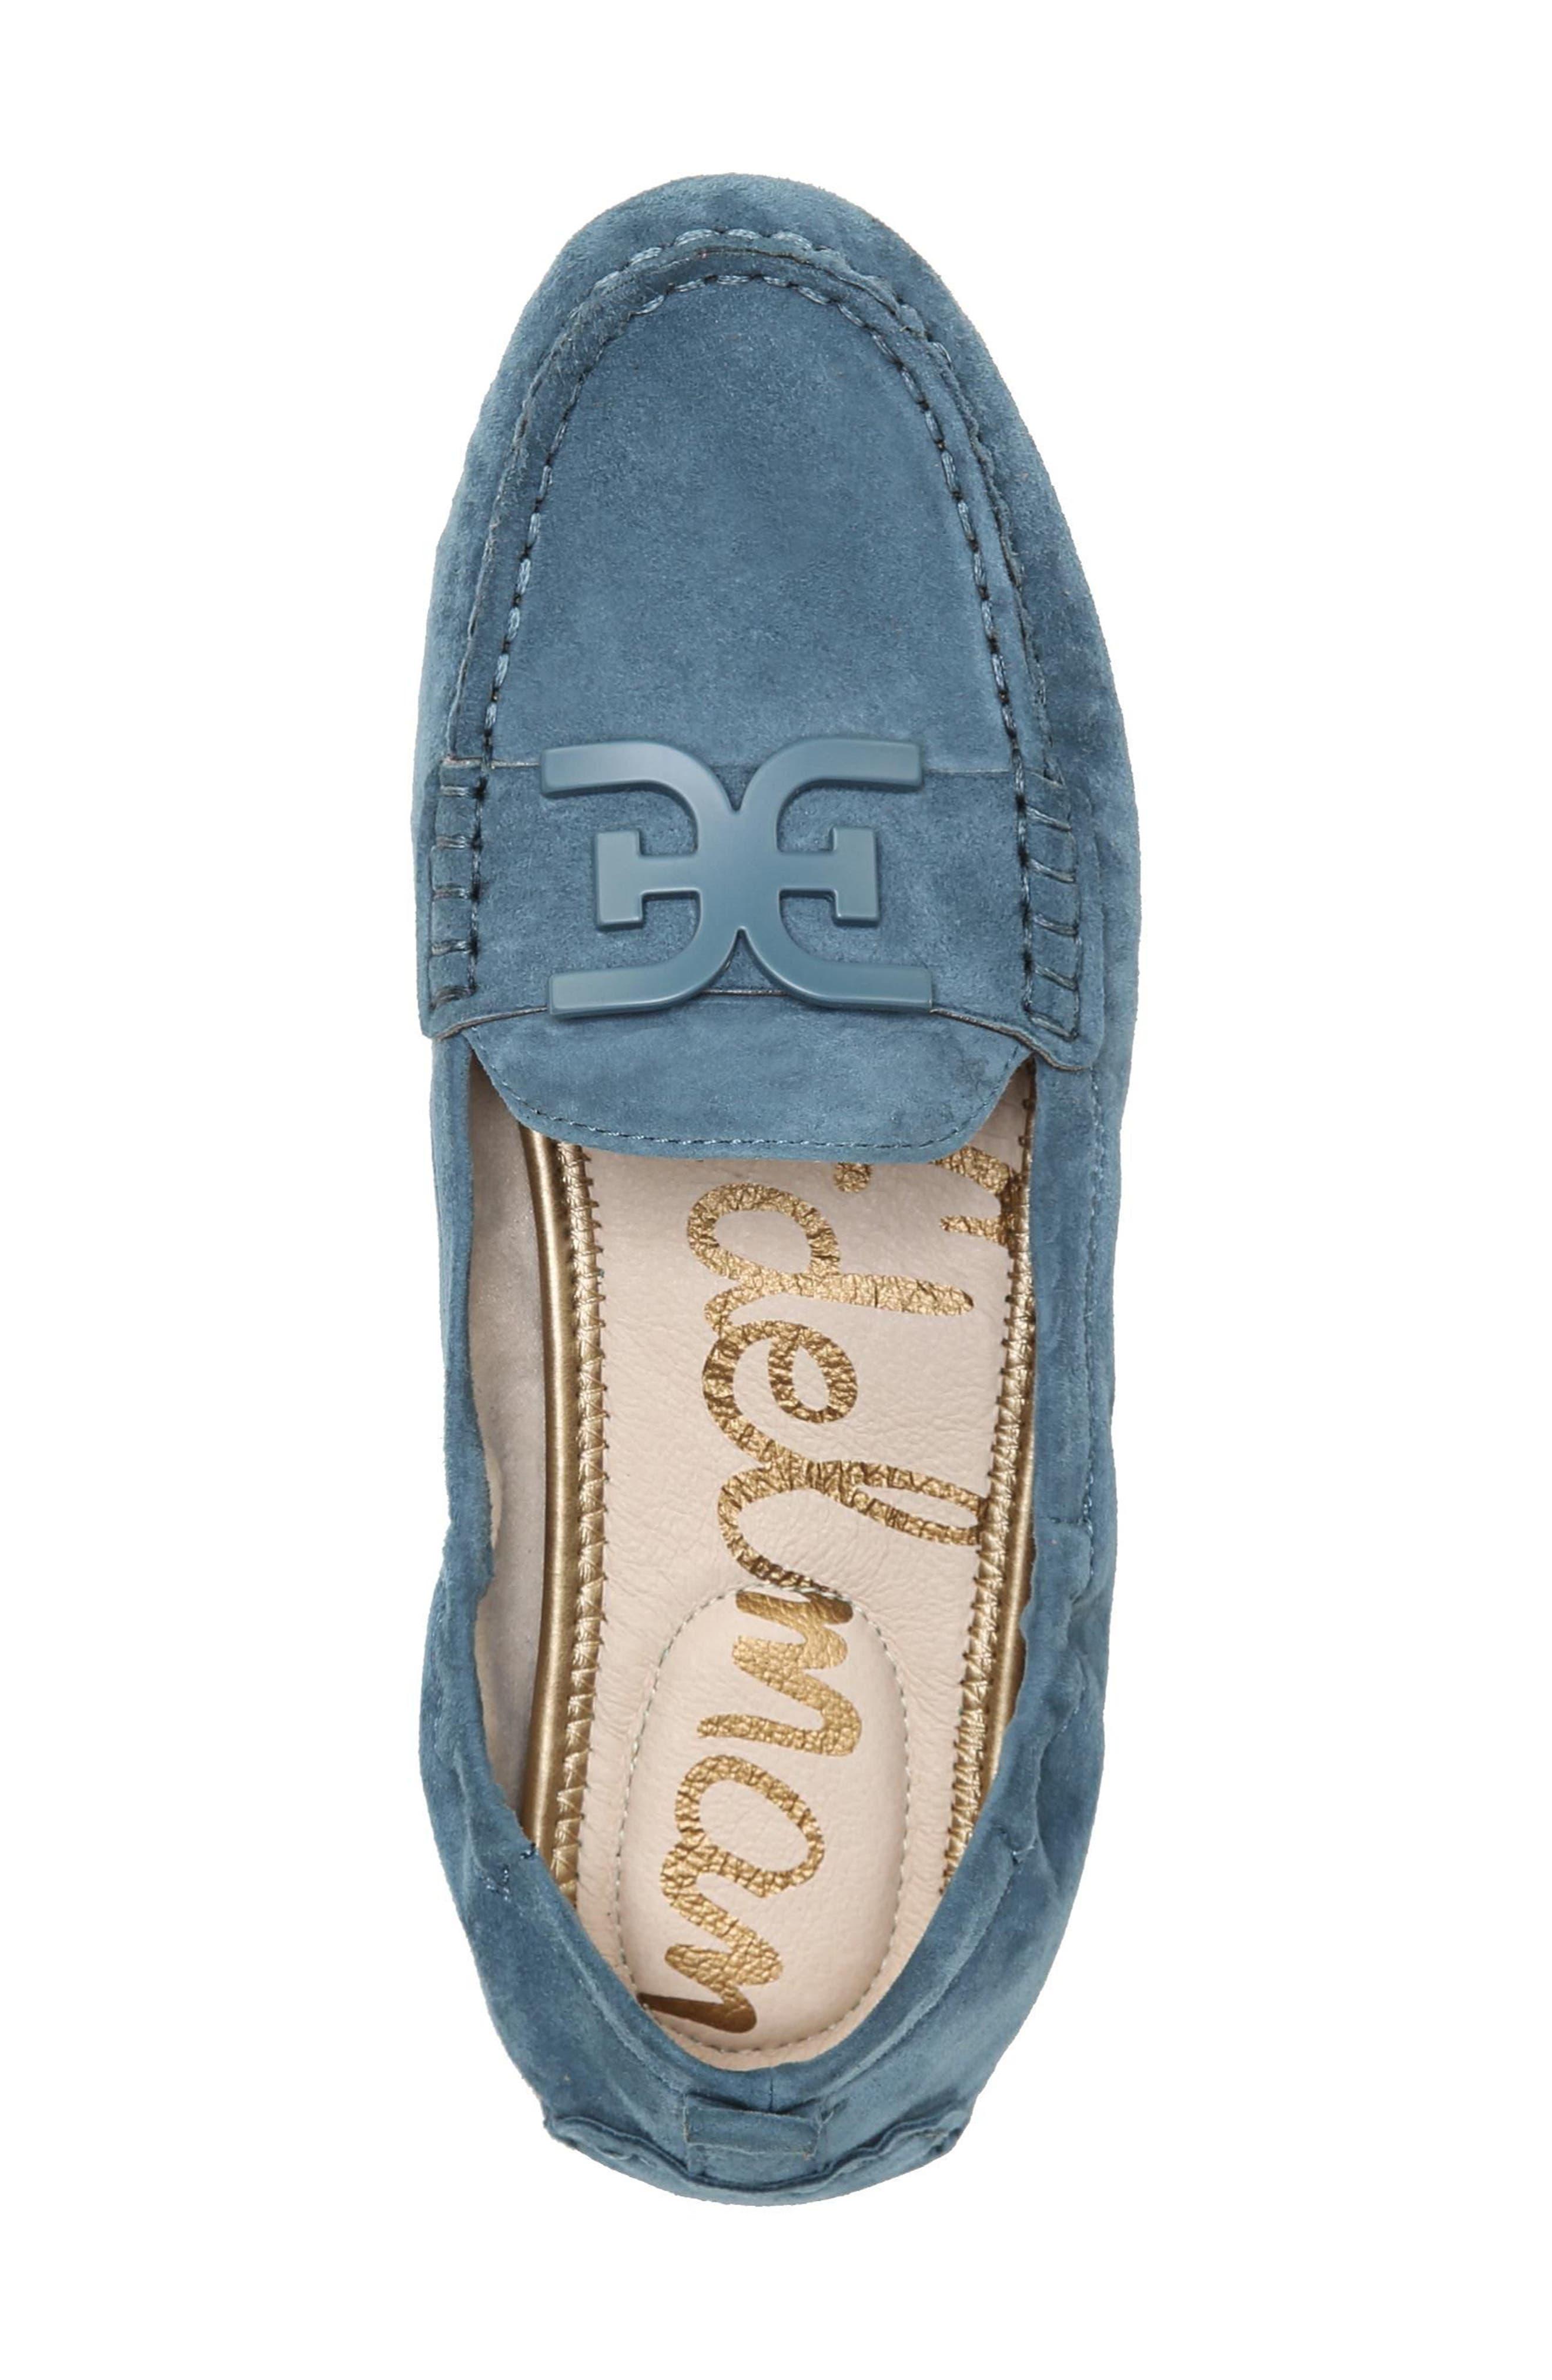 Farrell Moccasin Loafer,                             Alternate thumbnail 5, color,                             Denim Blue Suede